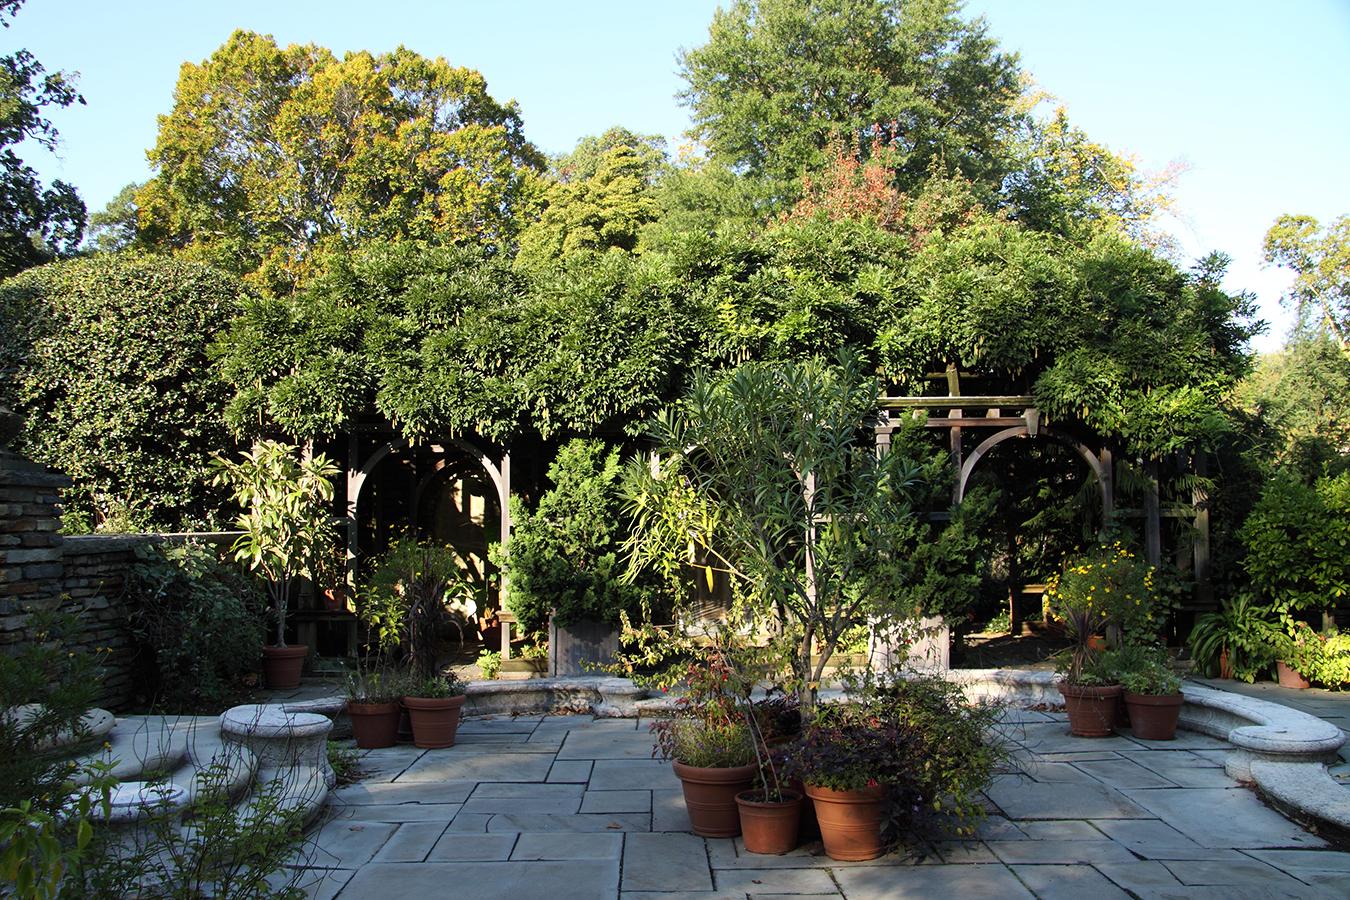 Arbor Terrace, facing west